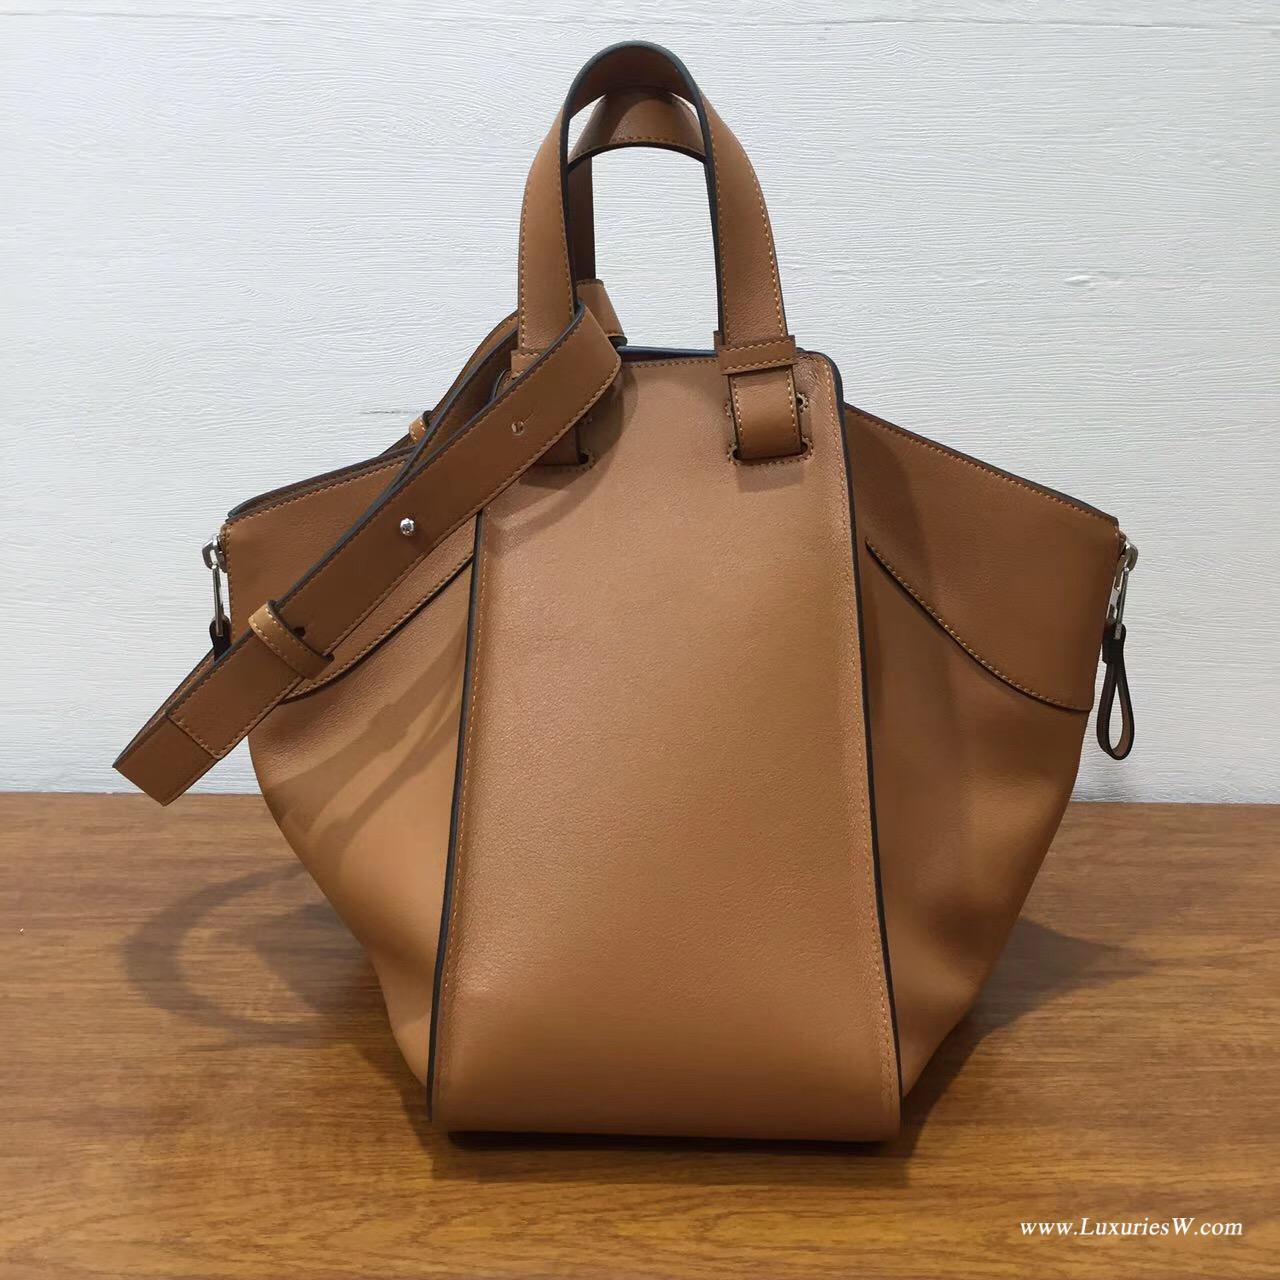 Loewe羅意威进口的柔軟小牛皮 Hammock  bag 大號棕褐色